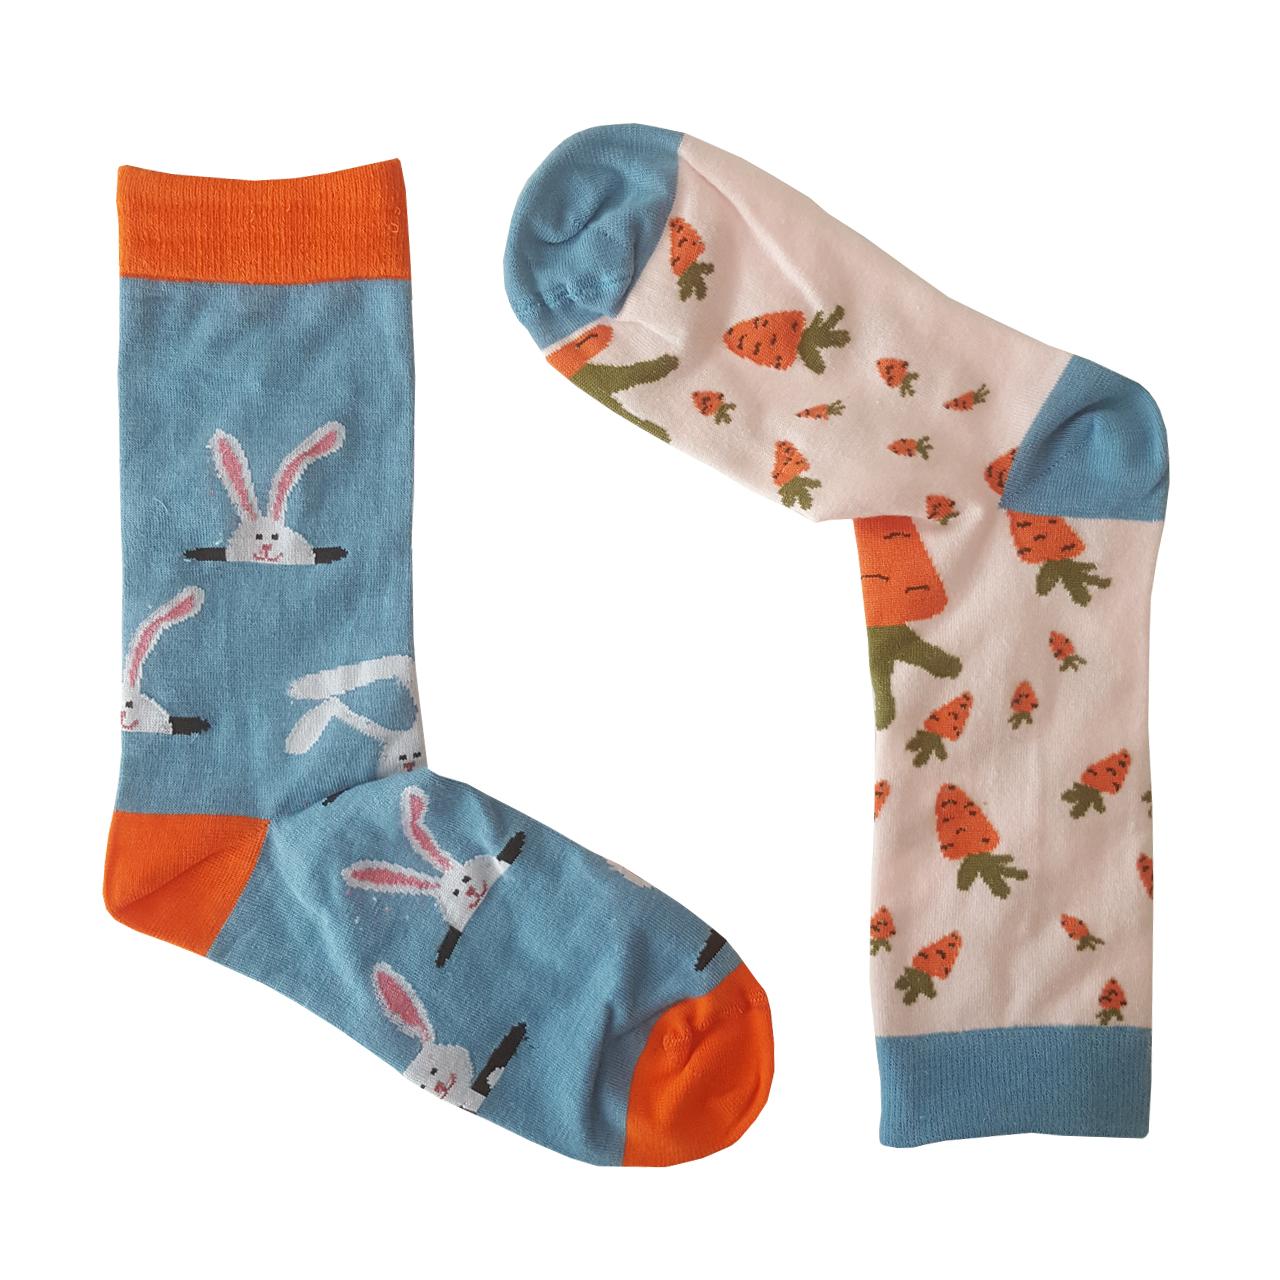 جوراب زنانه ال سون طرح خرگوش و هویج کد PH405 -  - 4